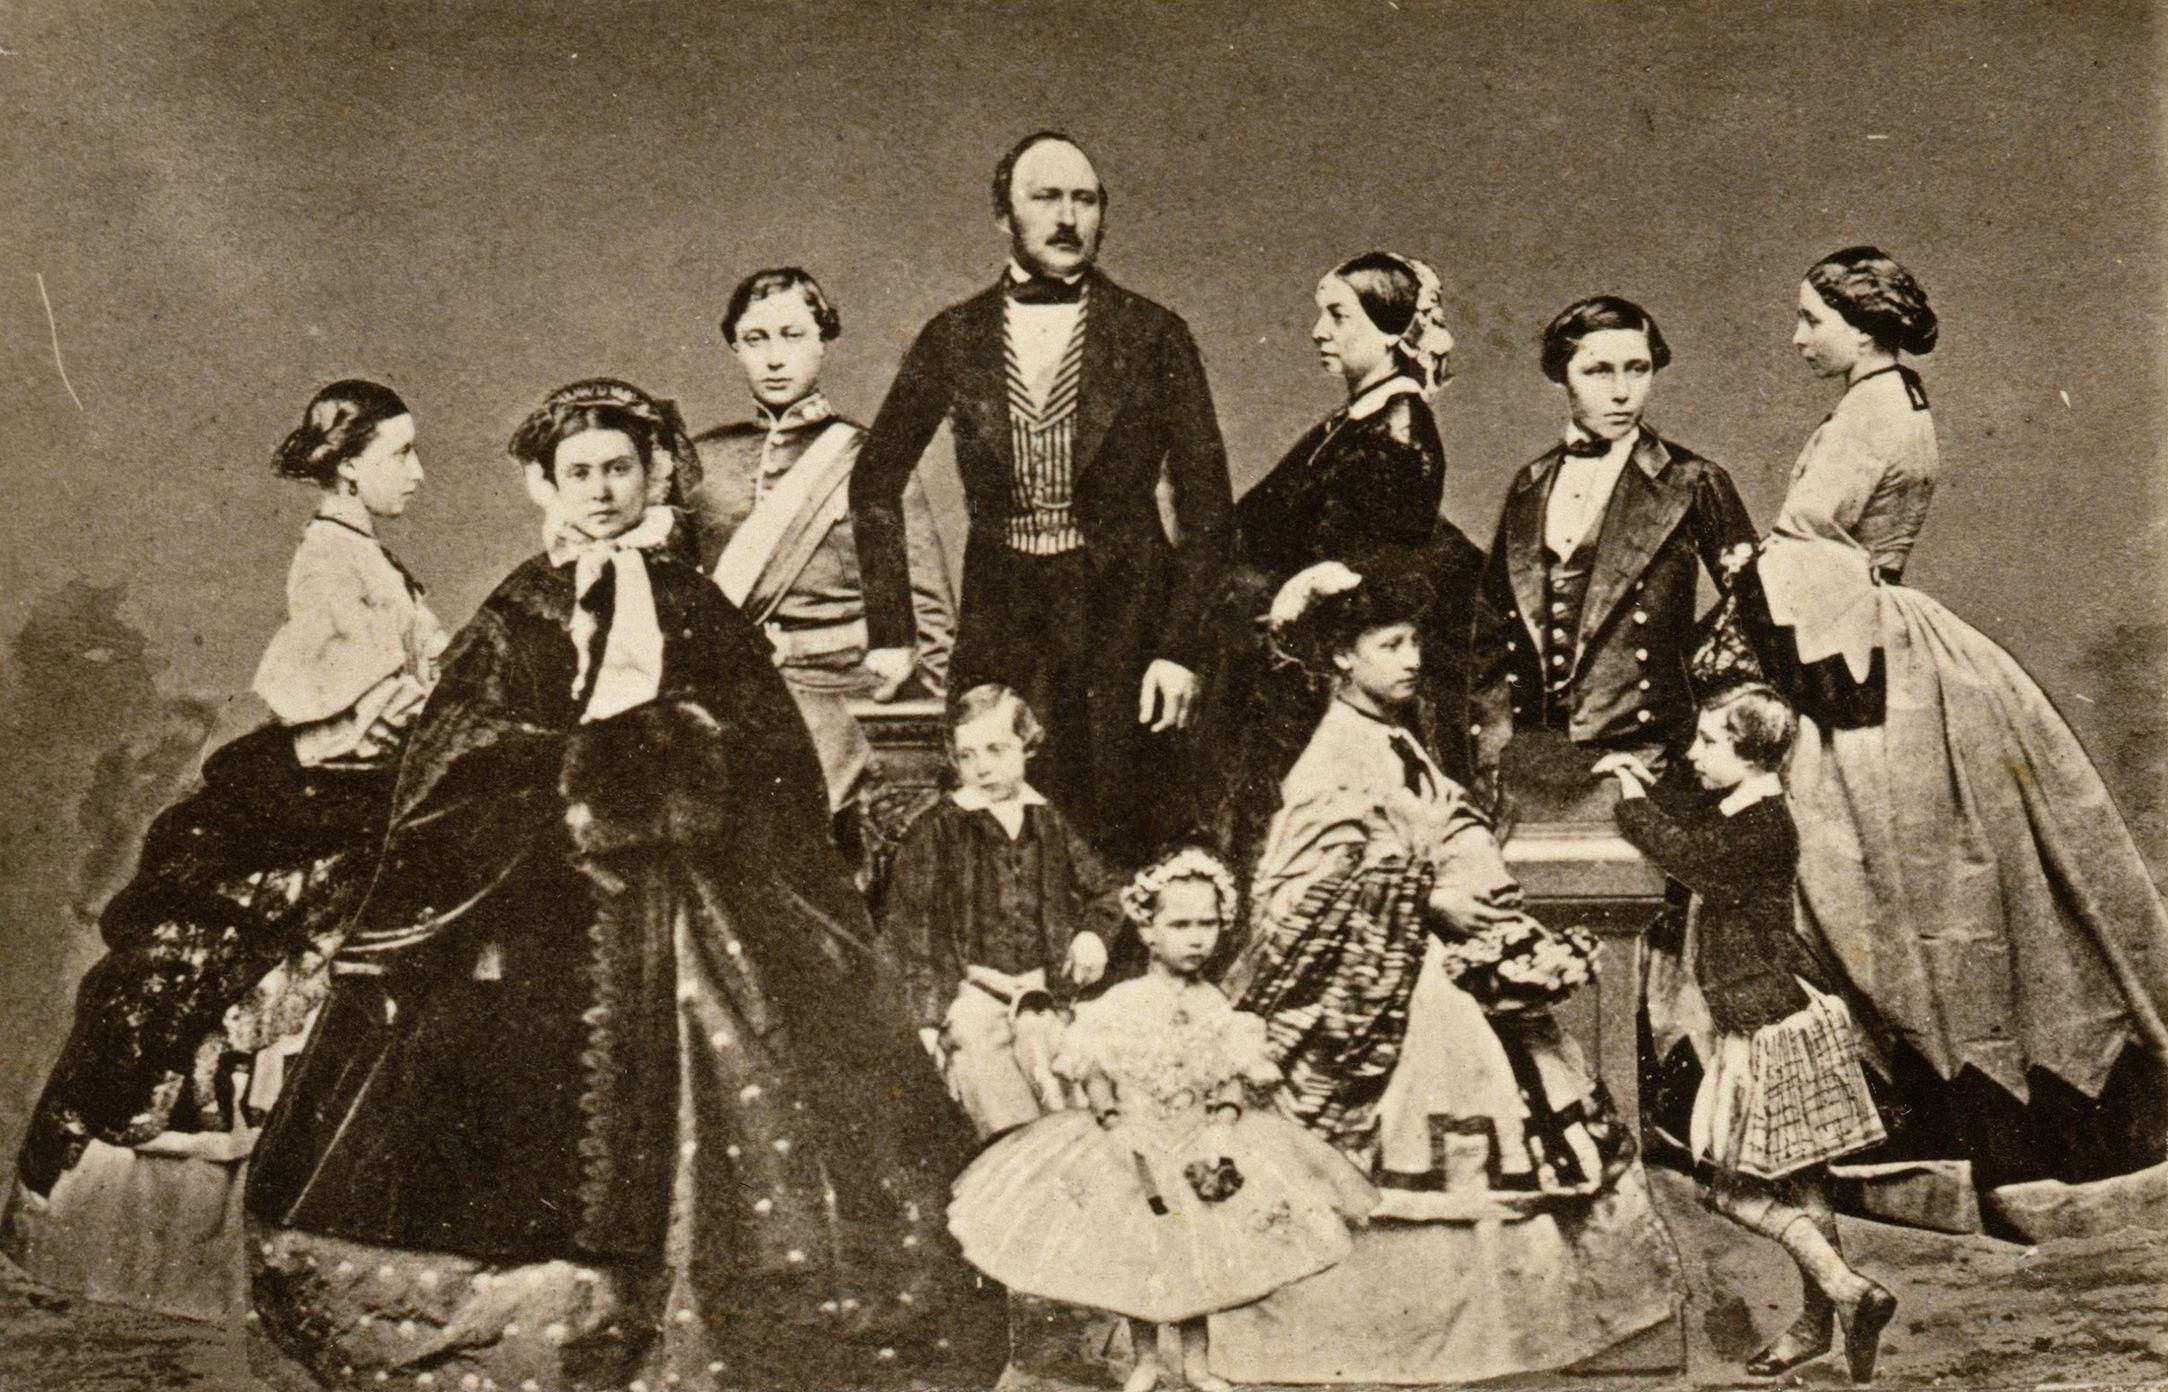 Chi era la Regina Vittoria d'Inghilterra, la biografia